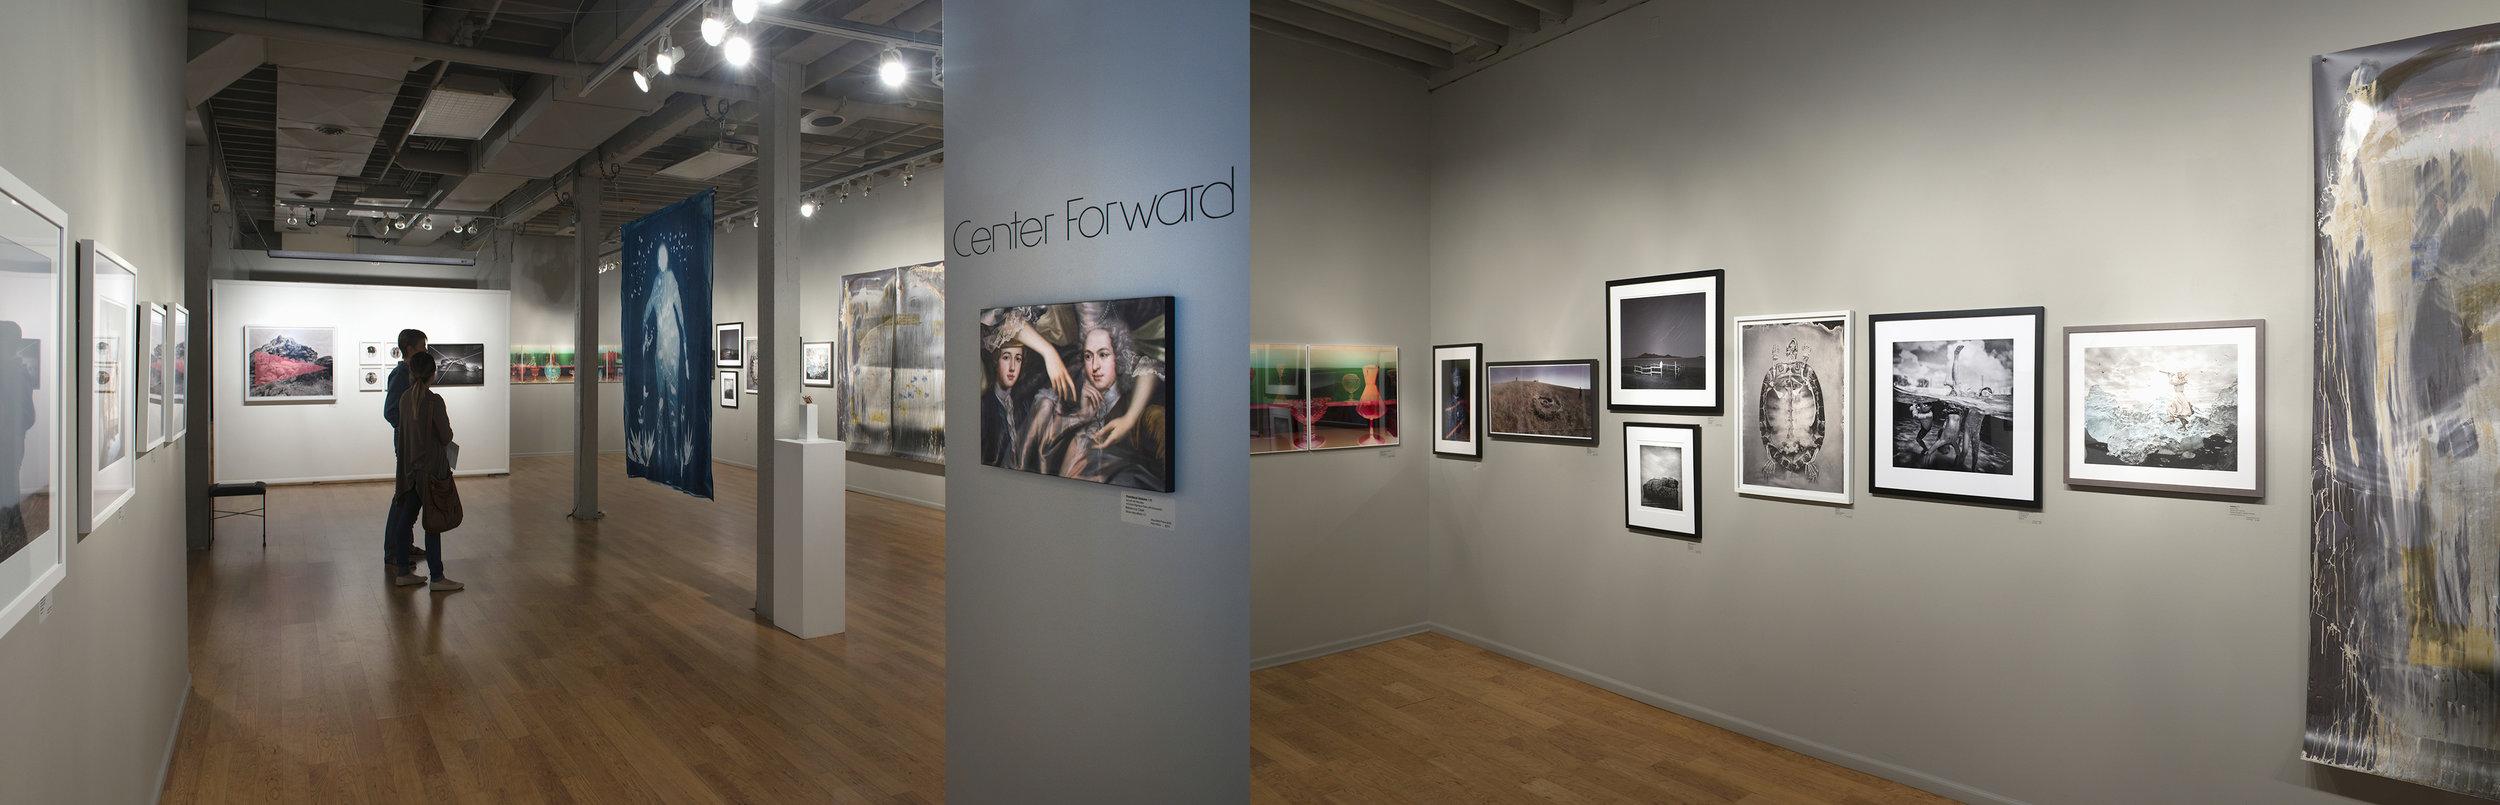 Annual Centre Forward  Group Exhibit, Centre for Fine Art Photography, Colorado, USA (2016).